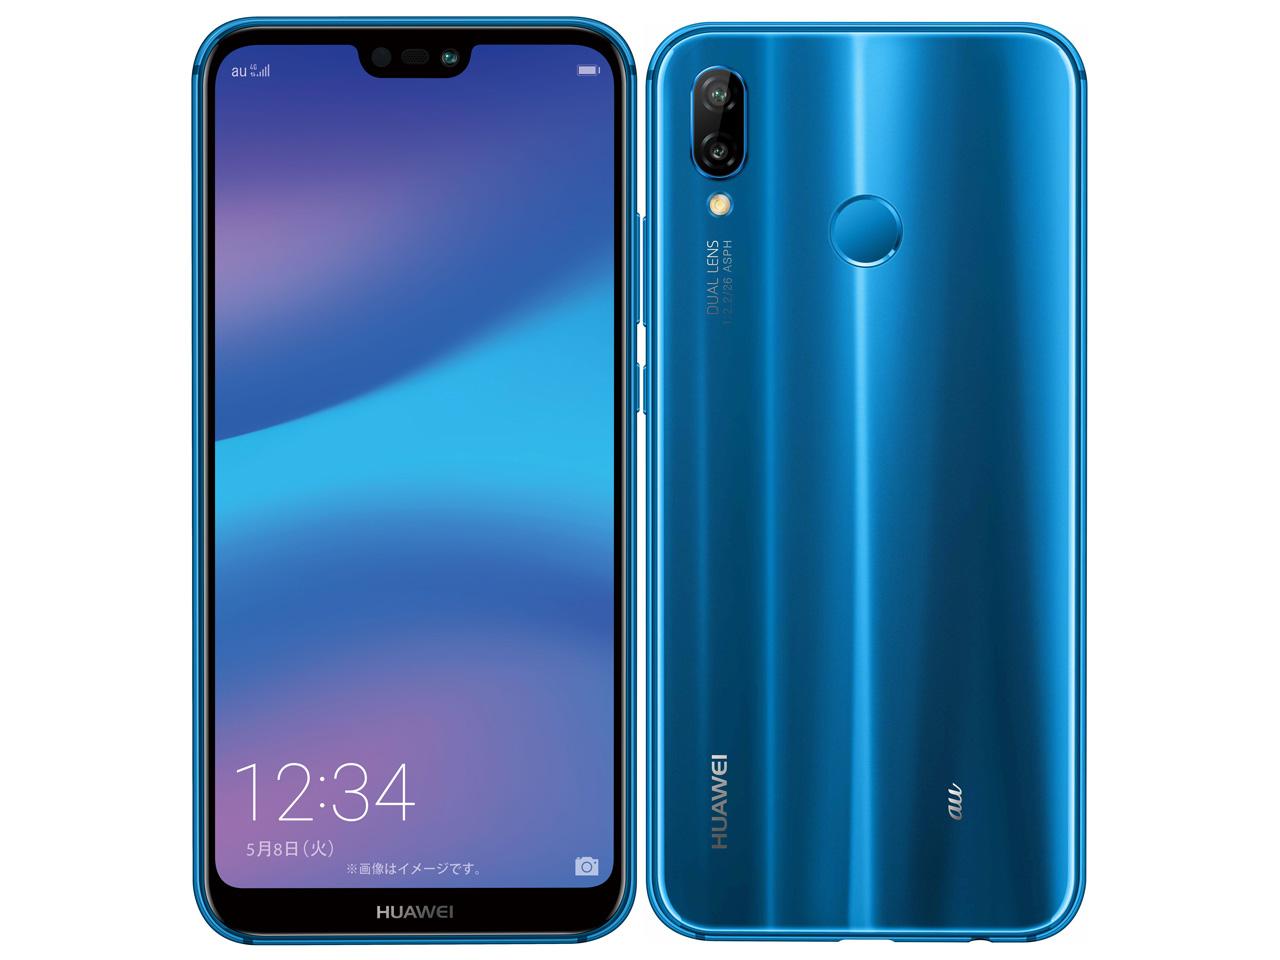 HUAWEI P20 lite HWV32 [クラインブルー] SIMロック解除済 au 白ロム 2018年夏モデル JAN:4941787064396